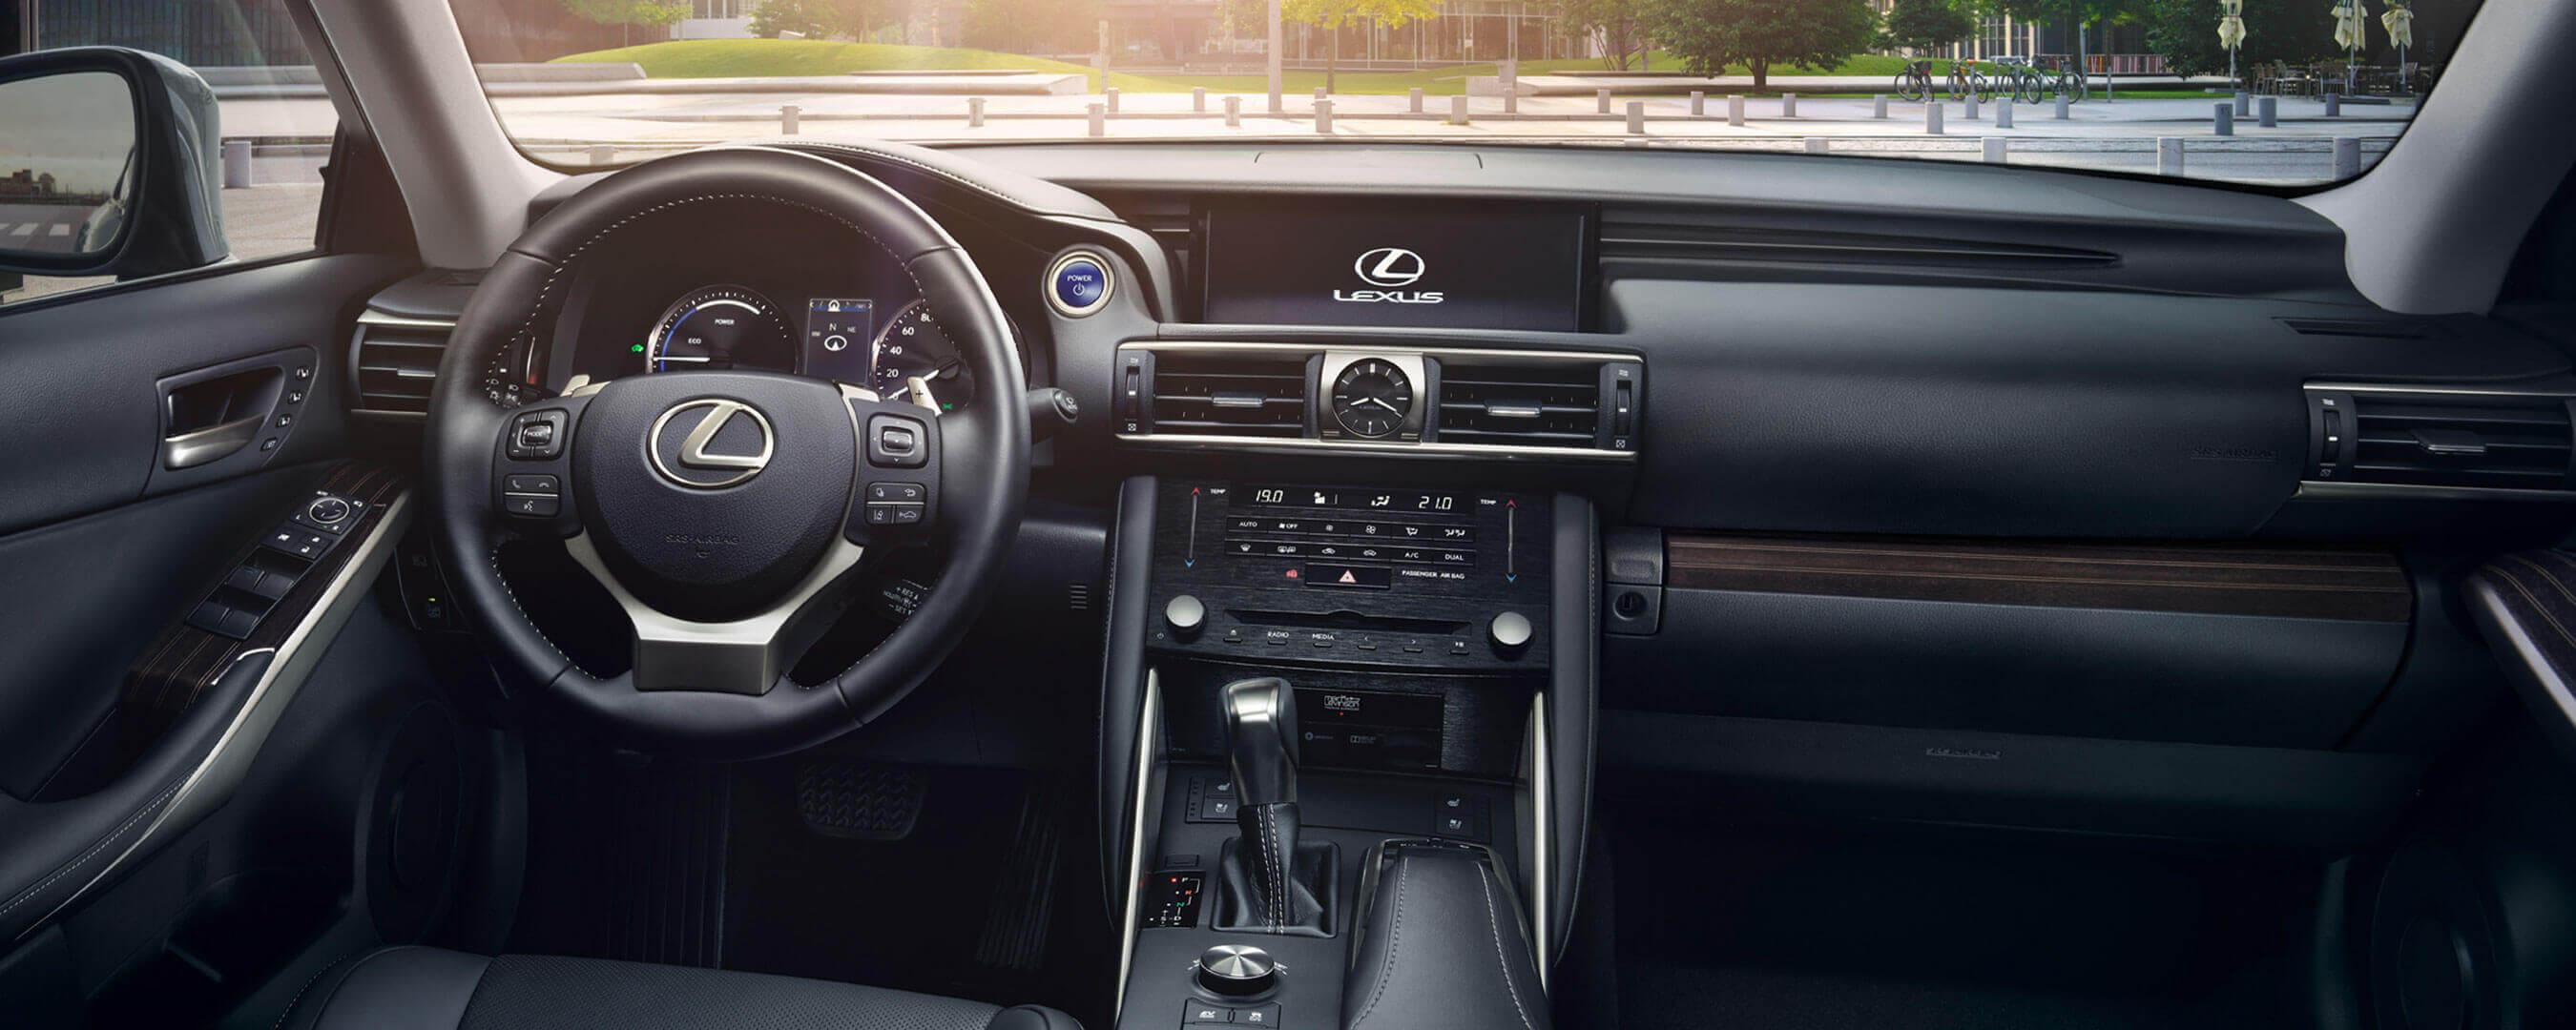 2017 lexus is 300h experience hero interior front